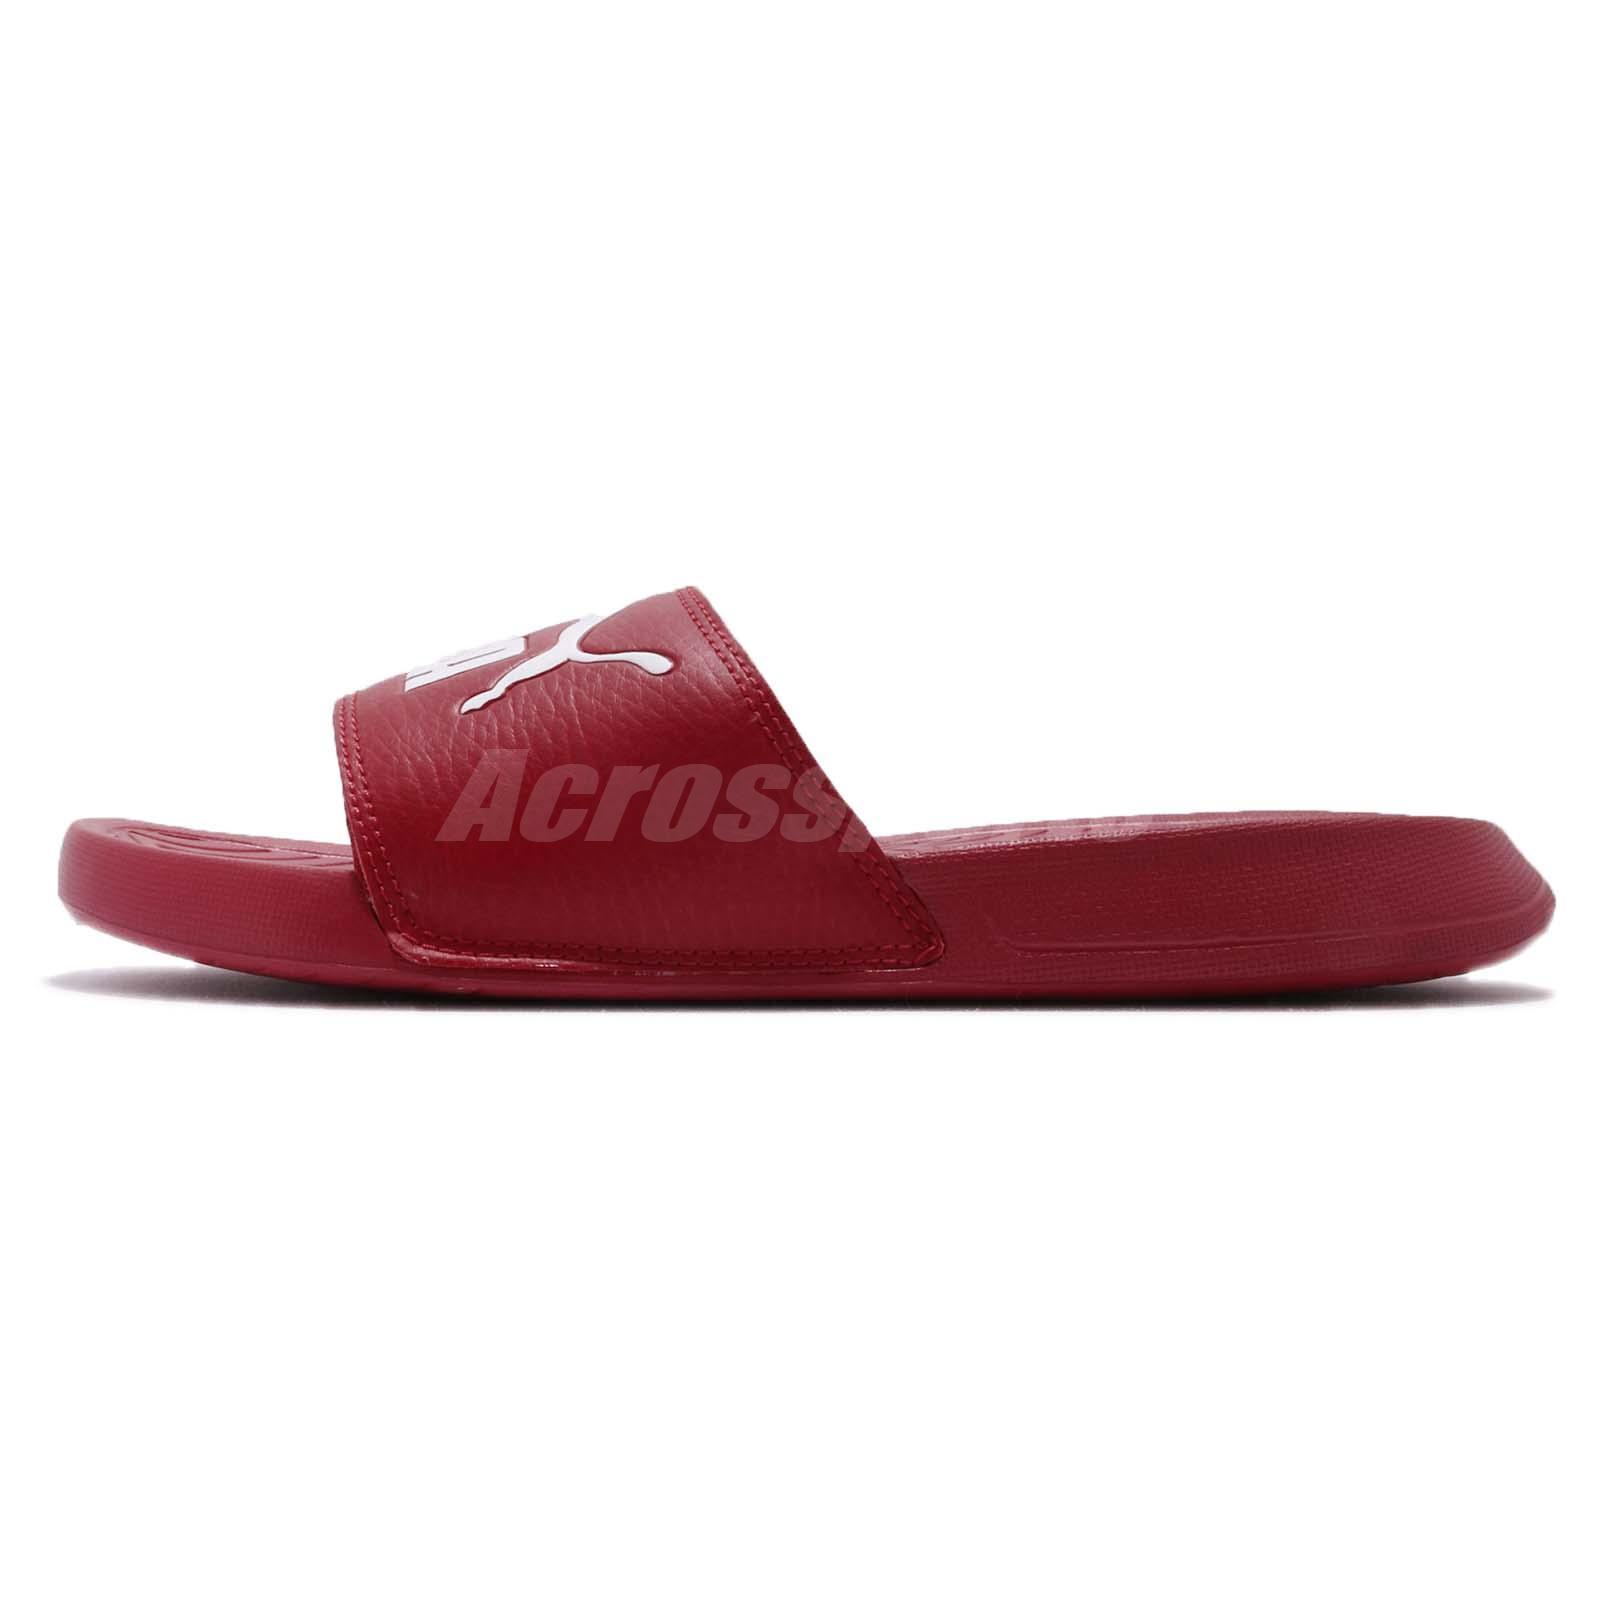 a3edd48c8ae8dd Puma Popcat Red White Men Women Sandal Slippers Slides 360265-22